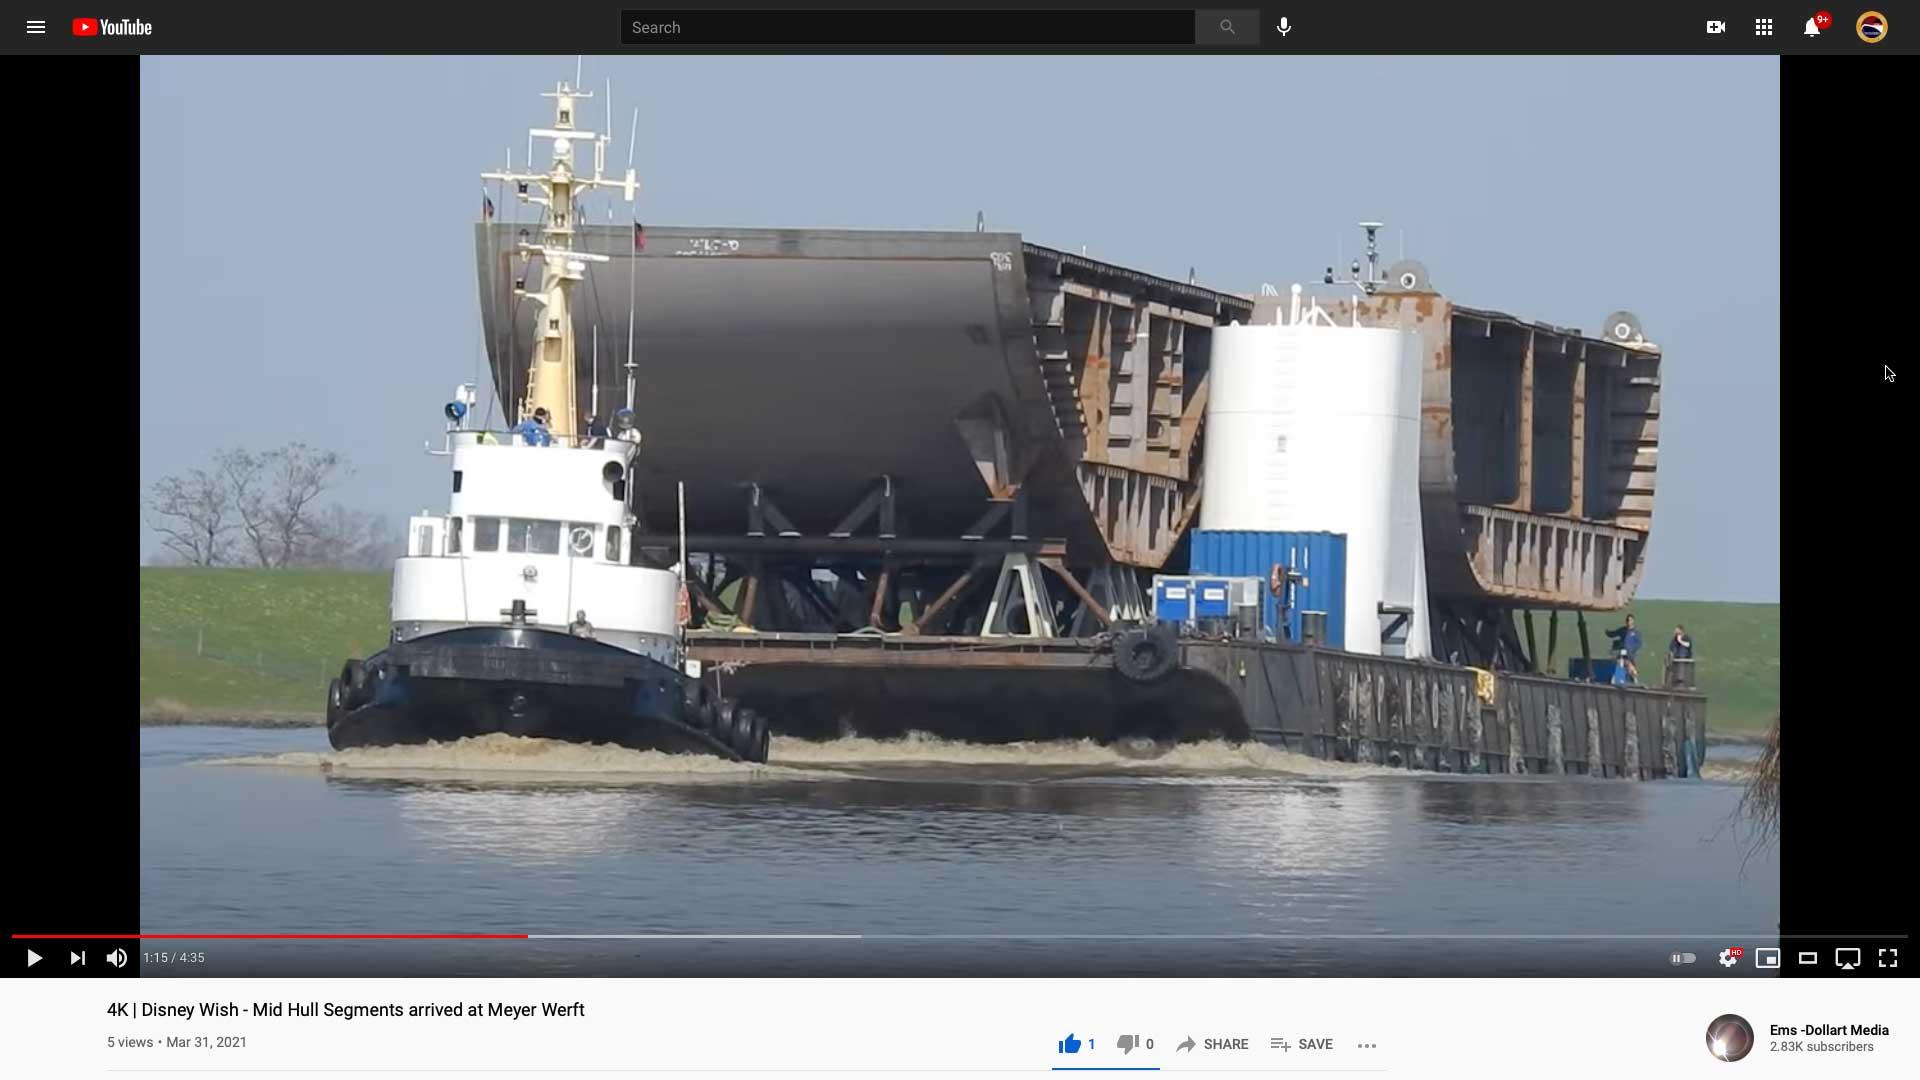 Disney Wish Mid Hull Superstructure Meyer Werft Ems Dollart Media 20210331